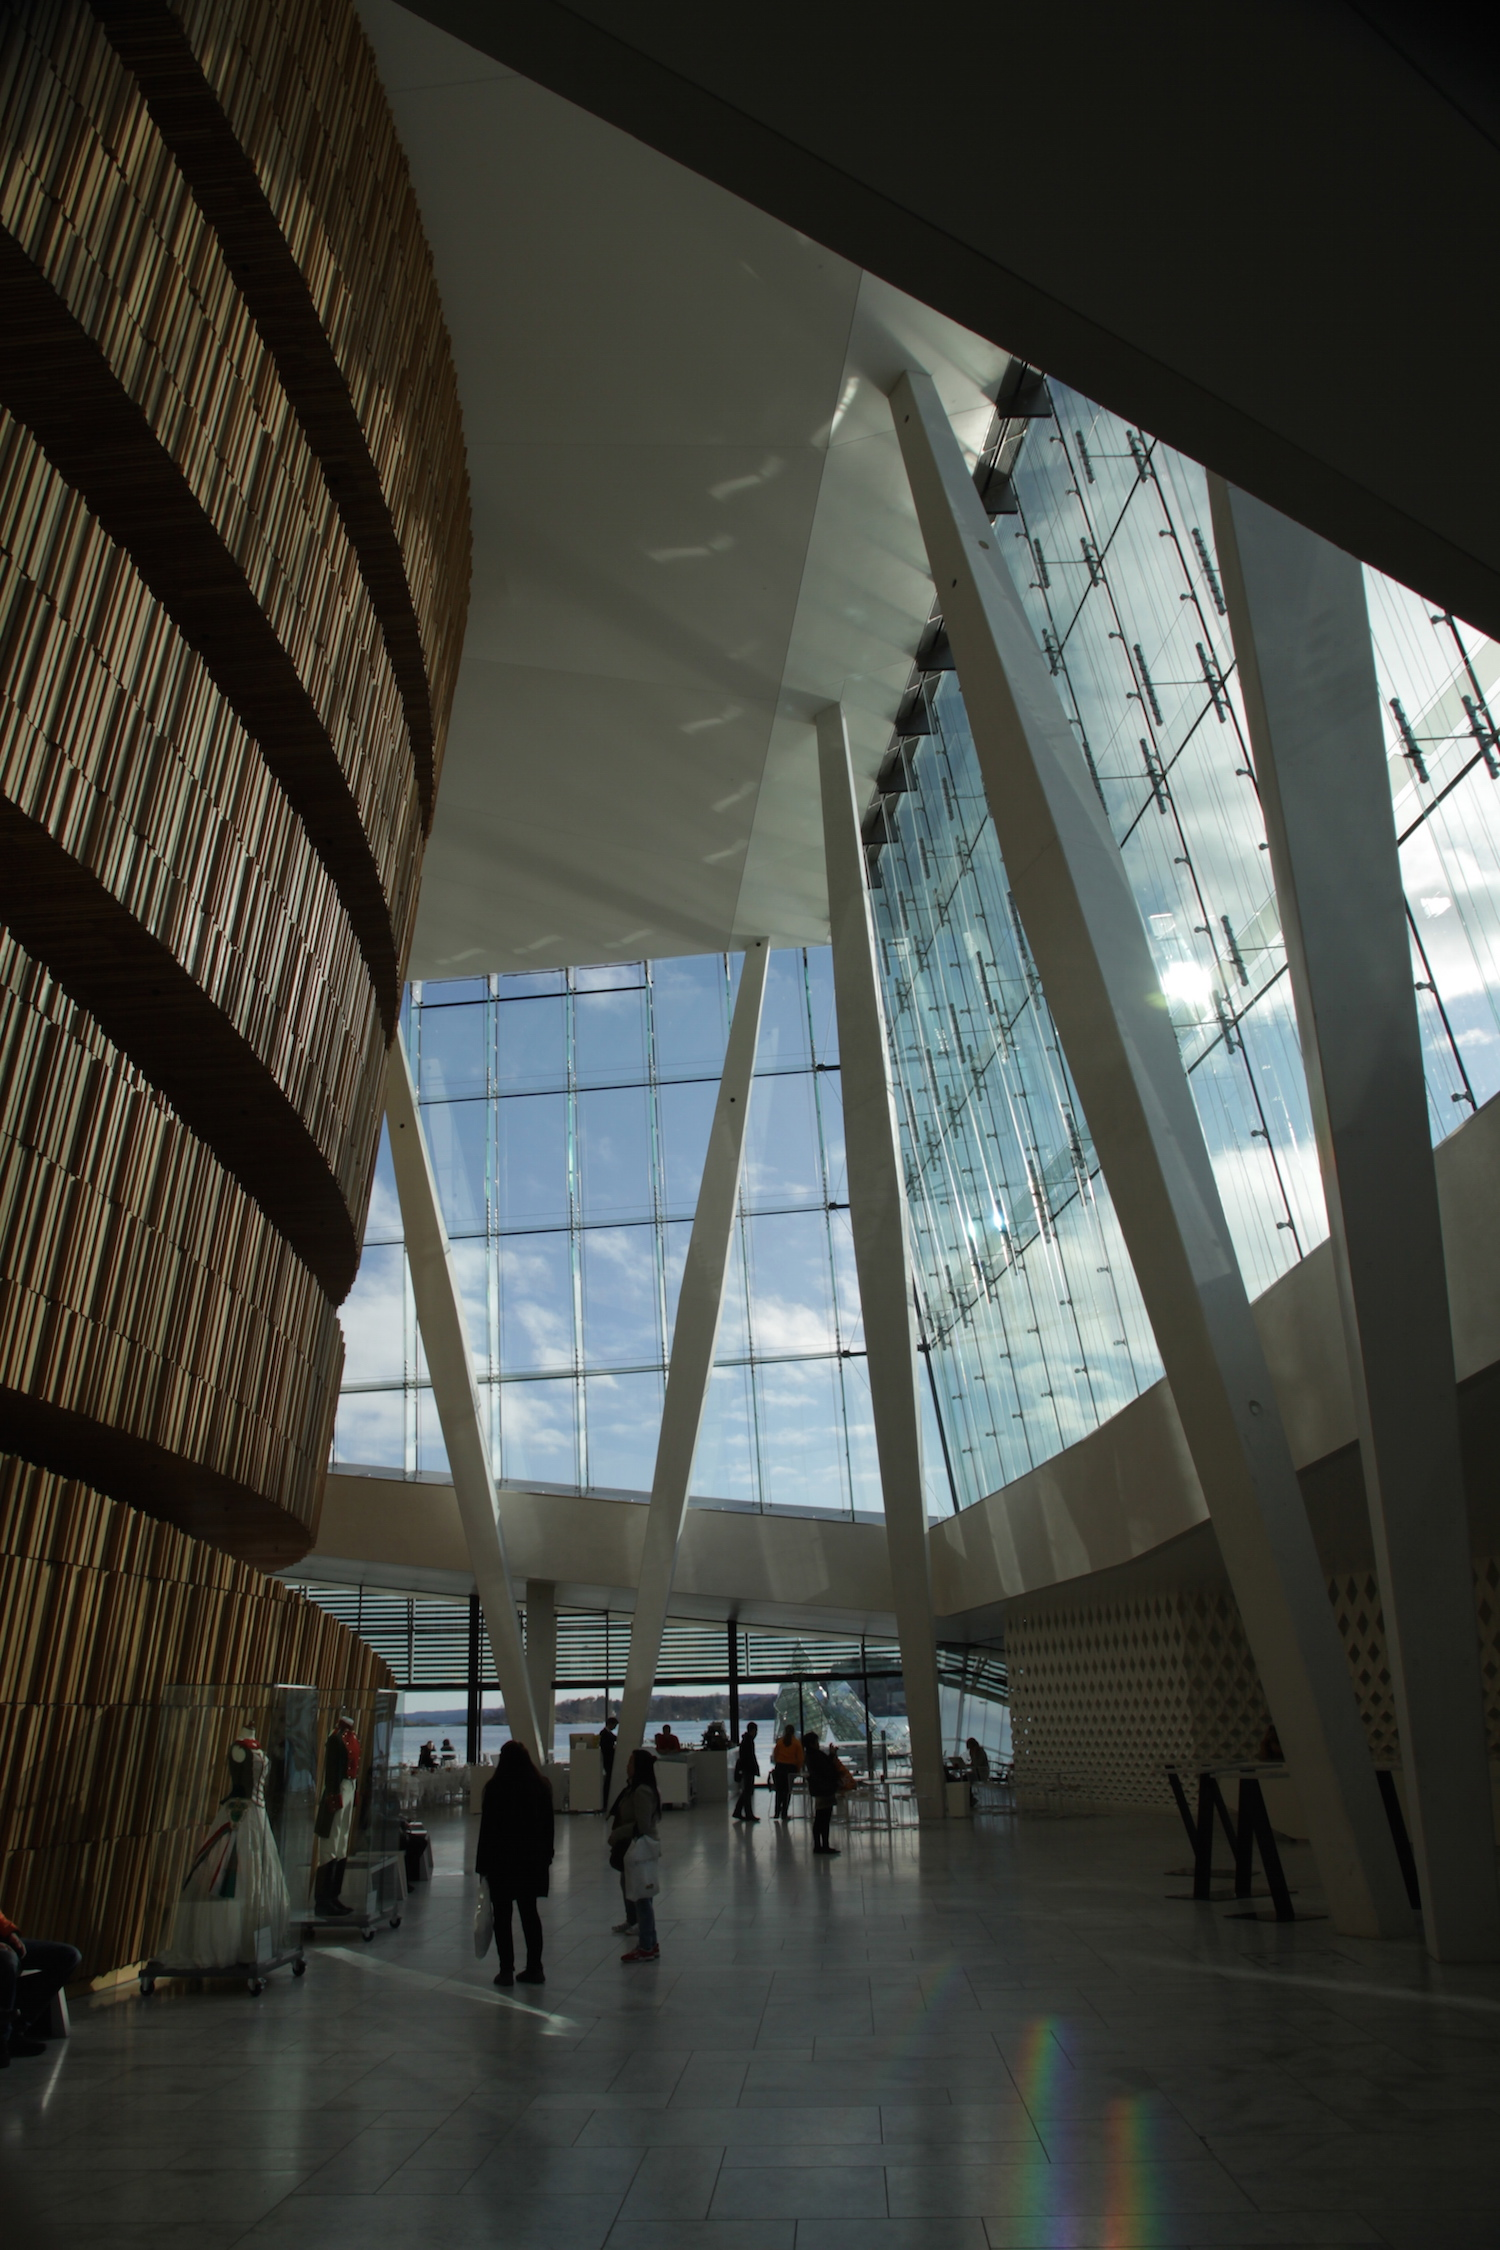 Inside the opera